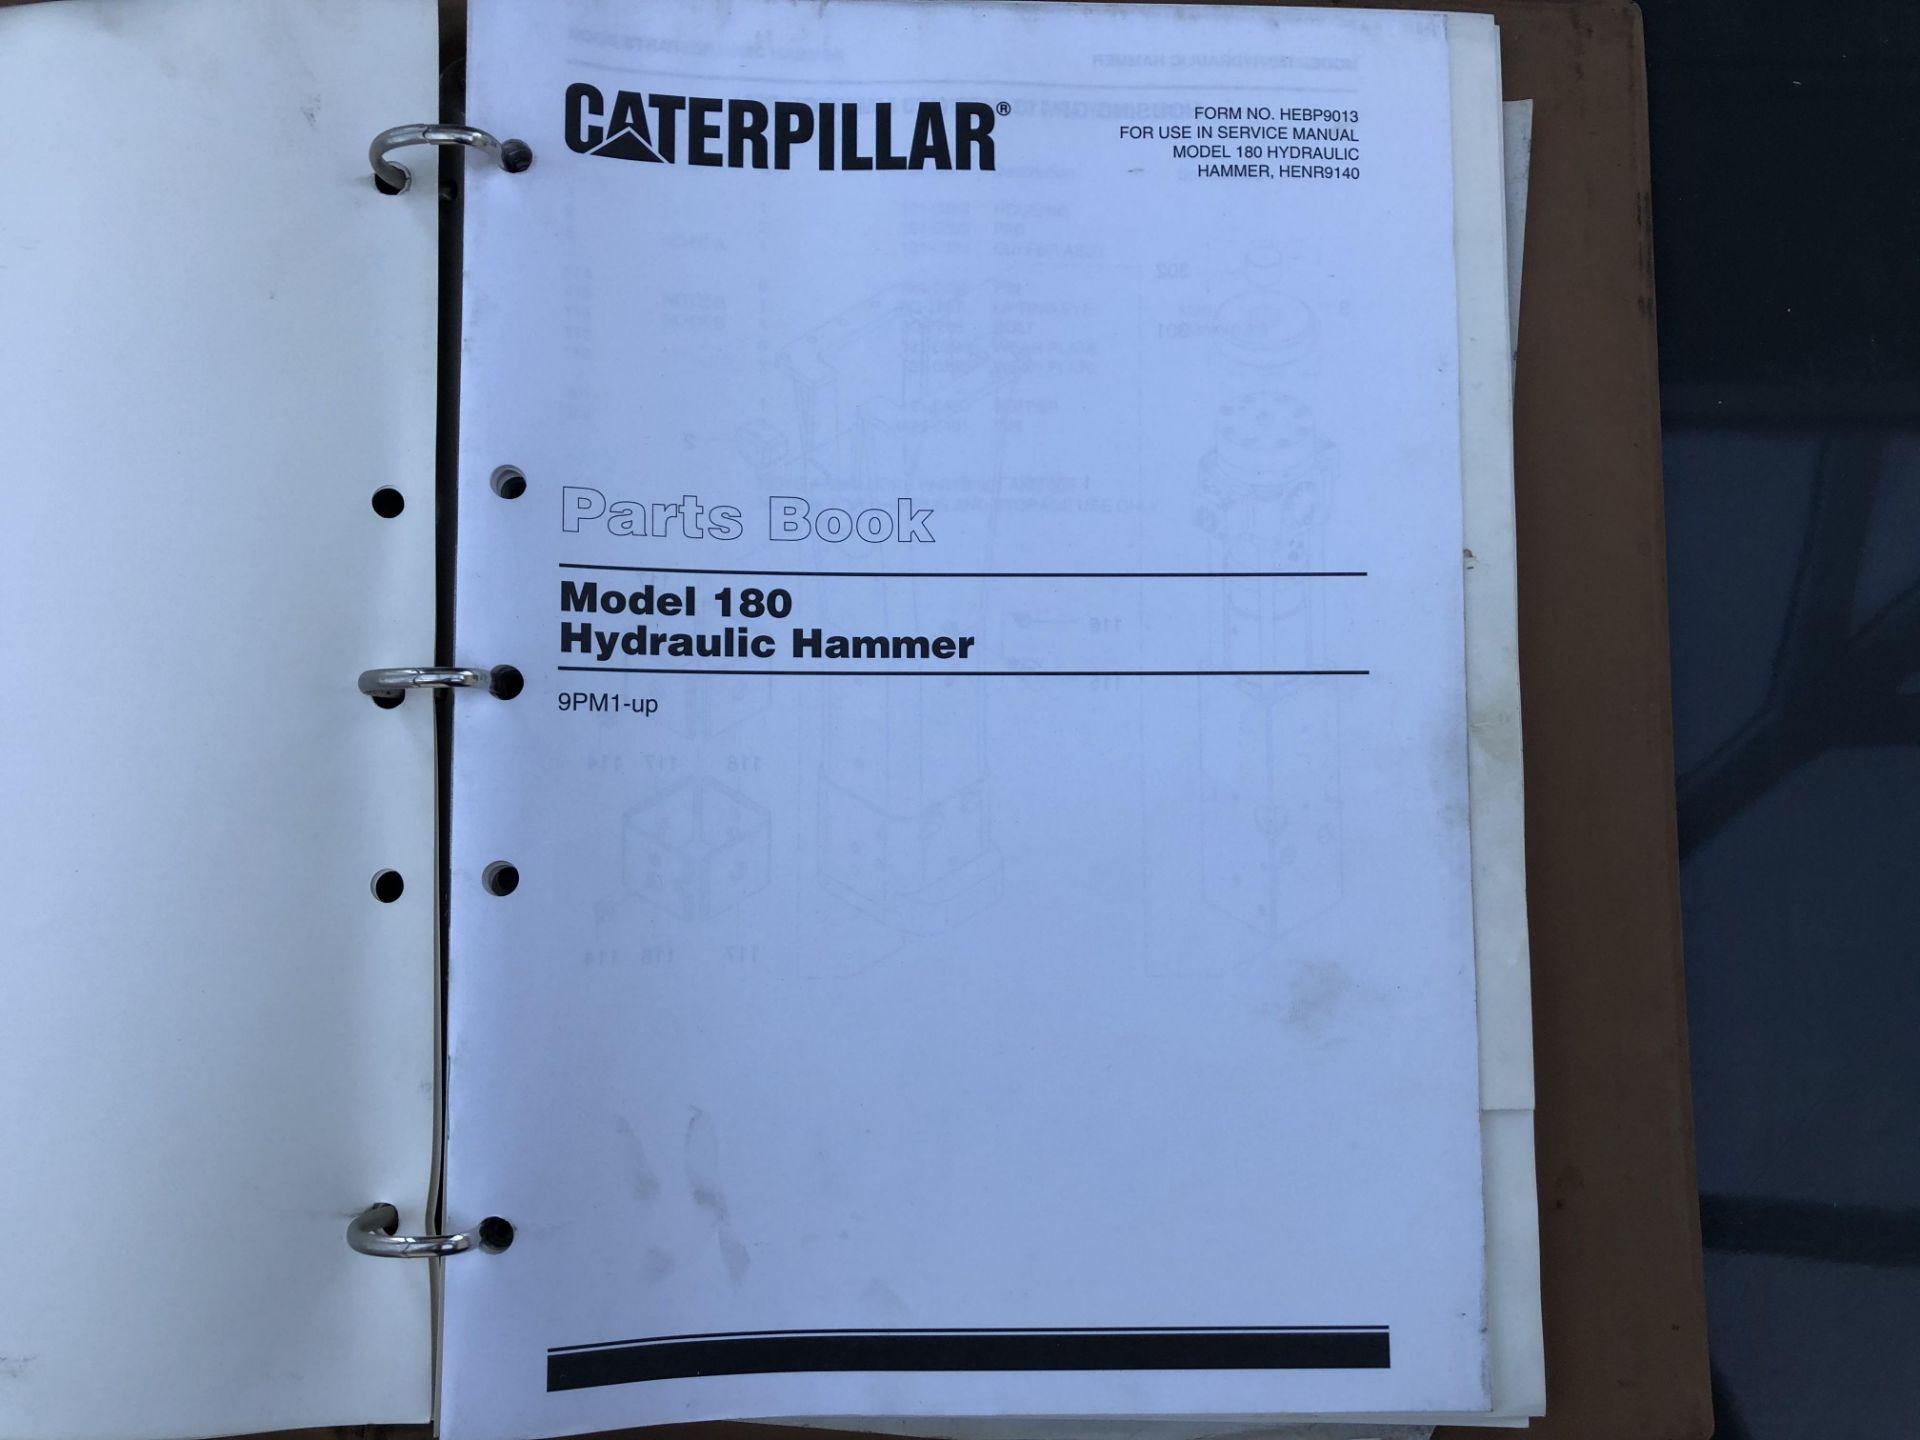 CATERPILLAR MODEL 180 HAMMER SERVICE MANUAL, GENUINE FACTORY CAT WORKSHOP MANUAL - Image 2 of 8